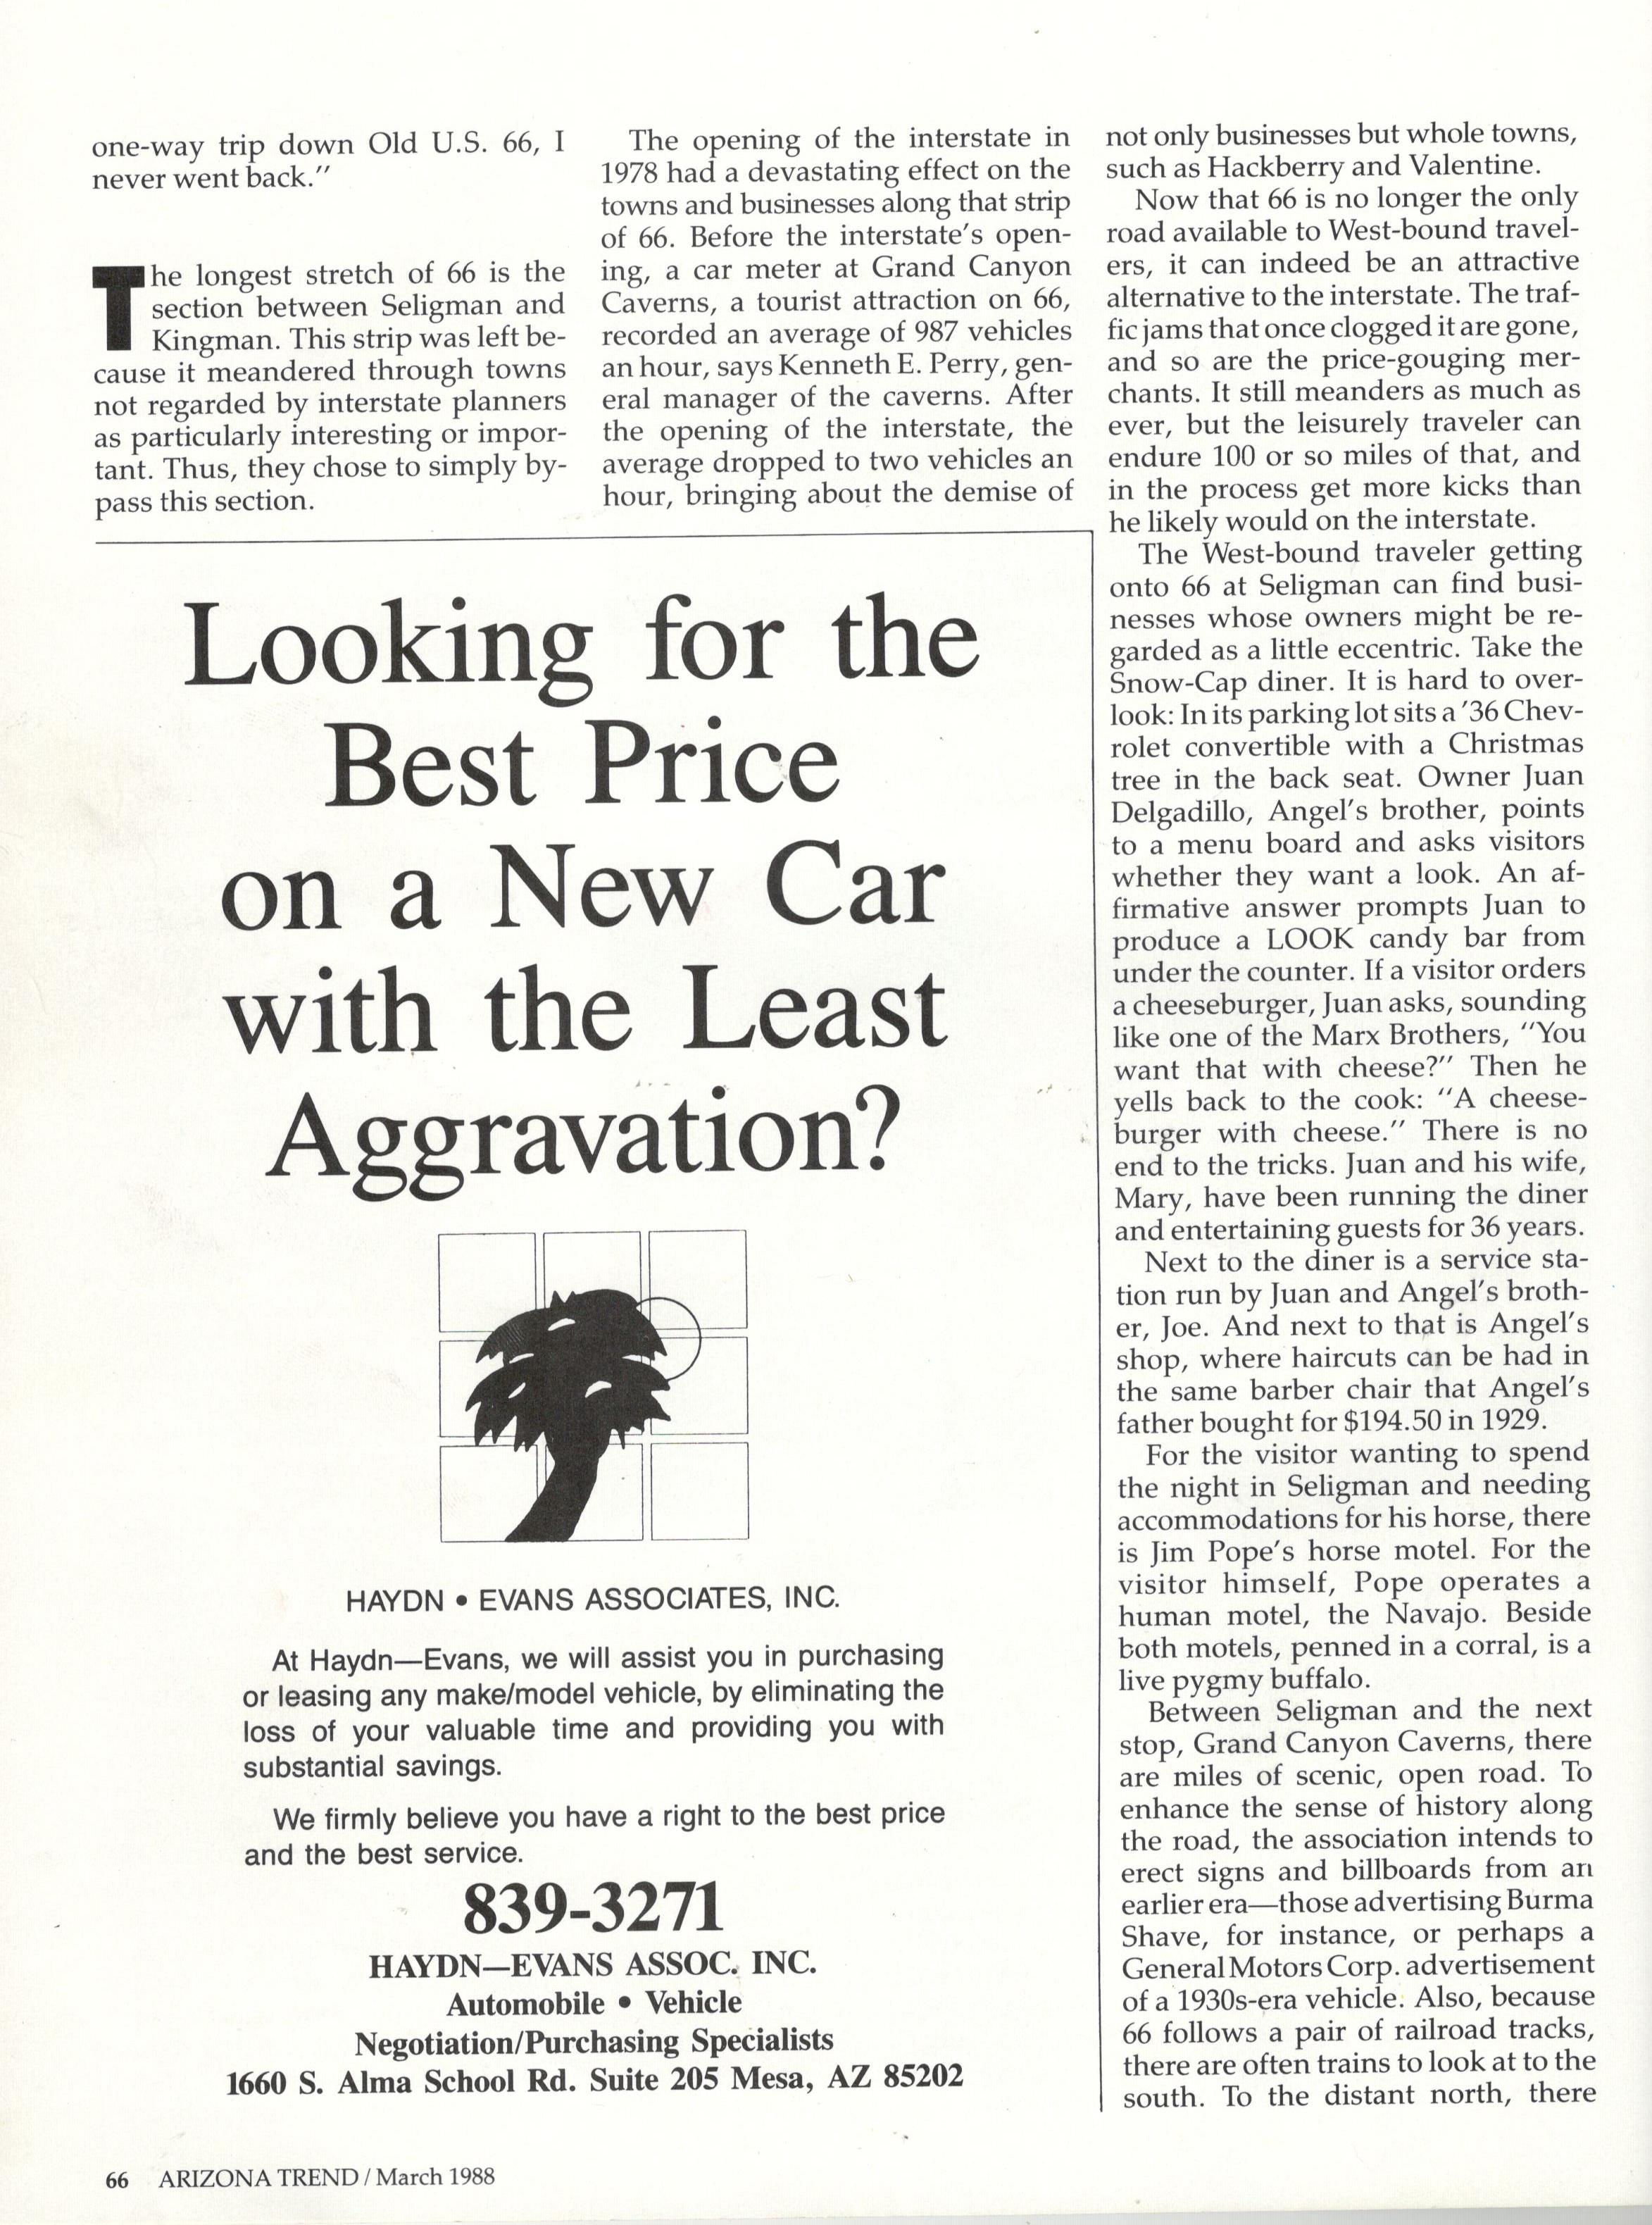 arizona-trend-march-1988-5.jpg